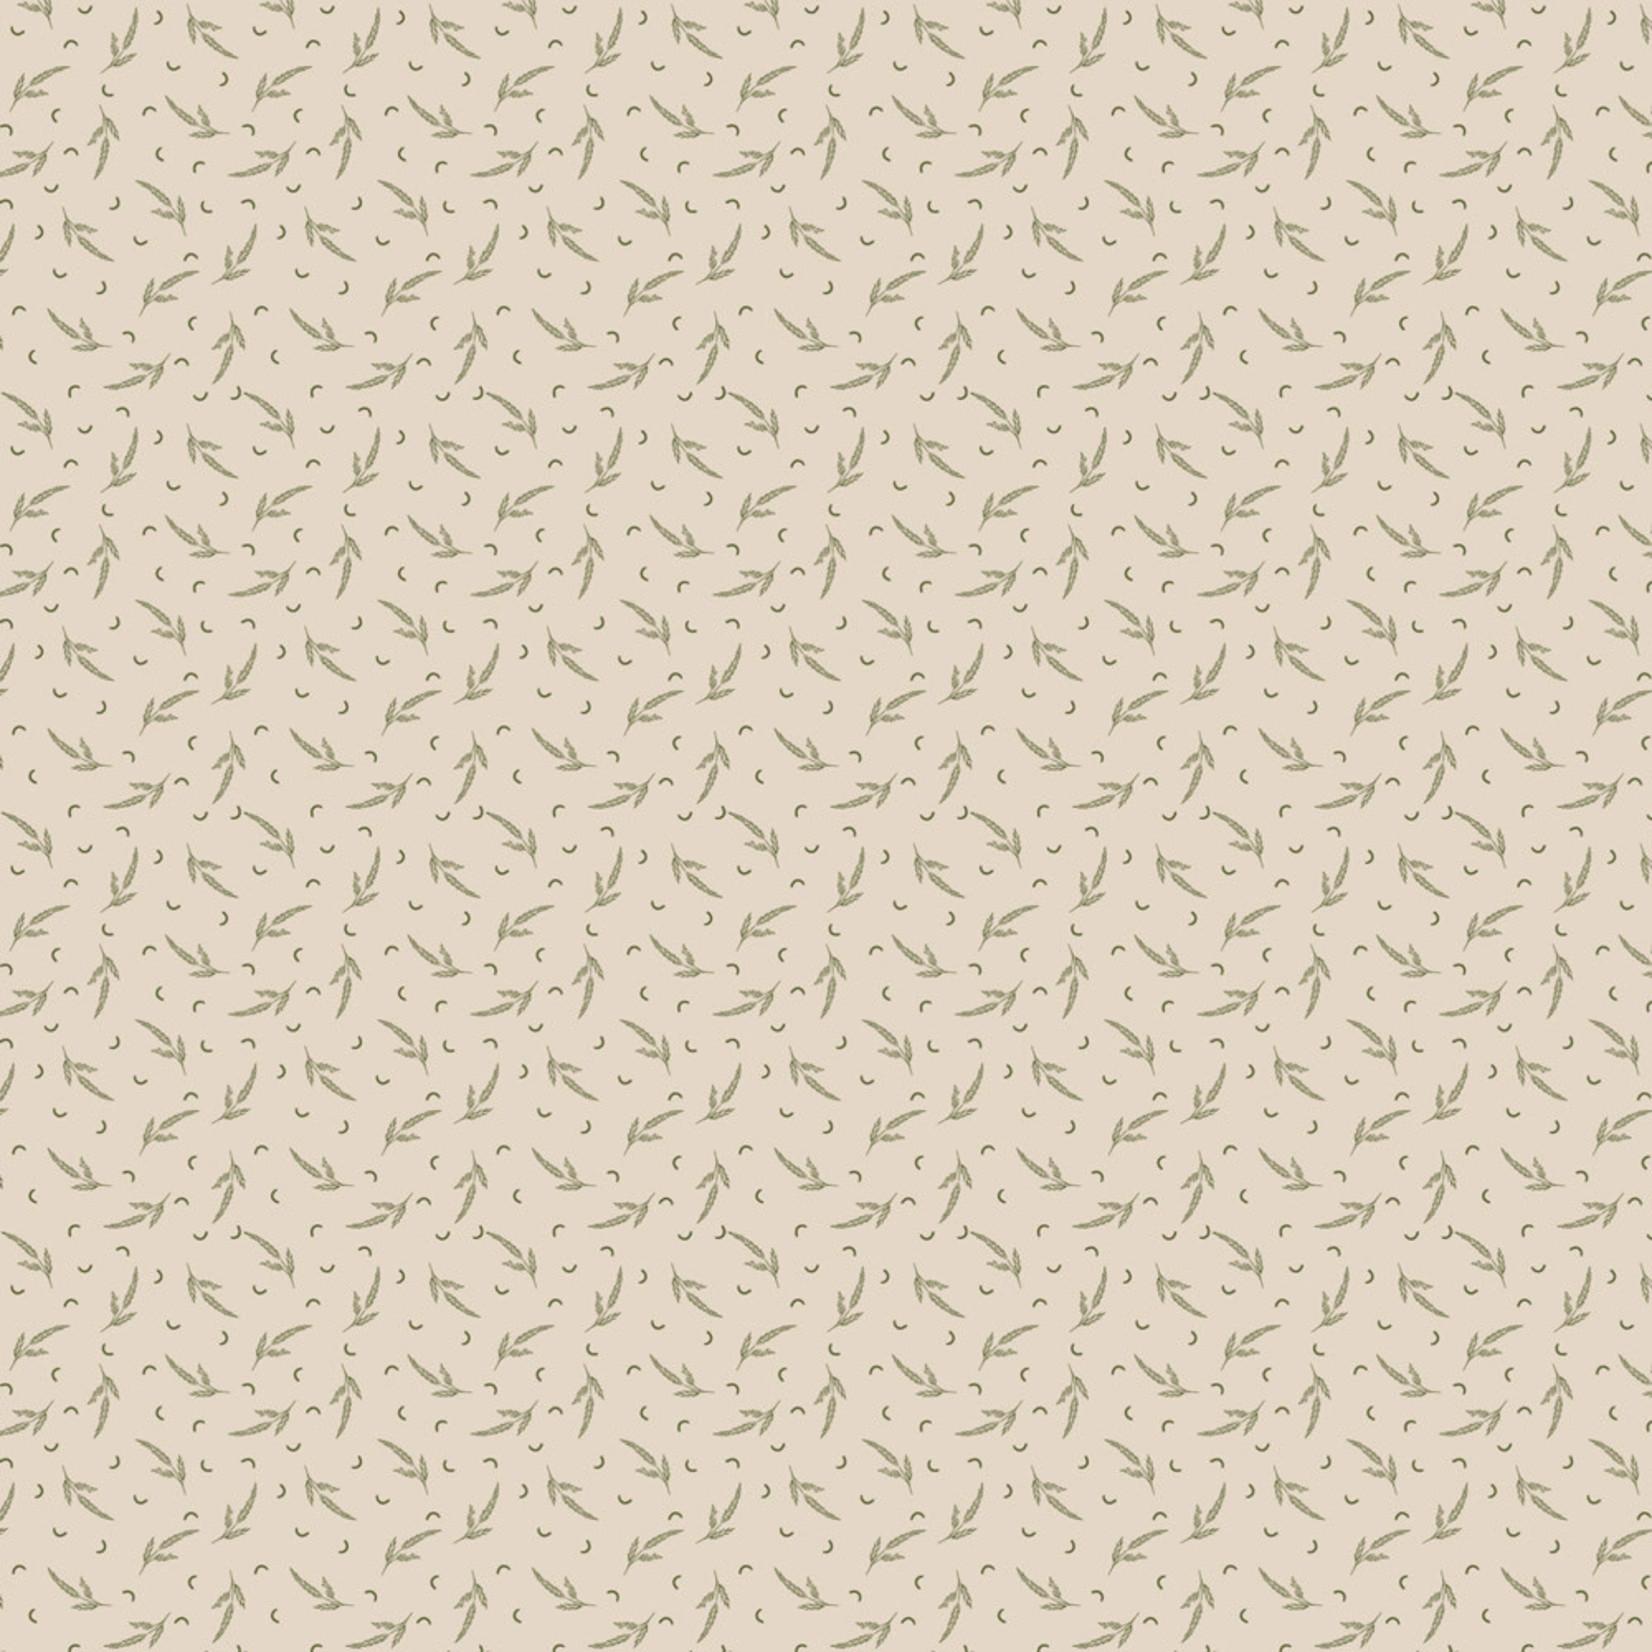 Stoffabrics Nellies Shirtlings - Stalks - Green